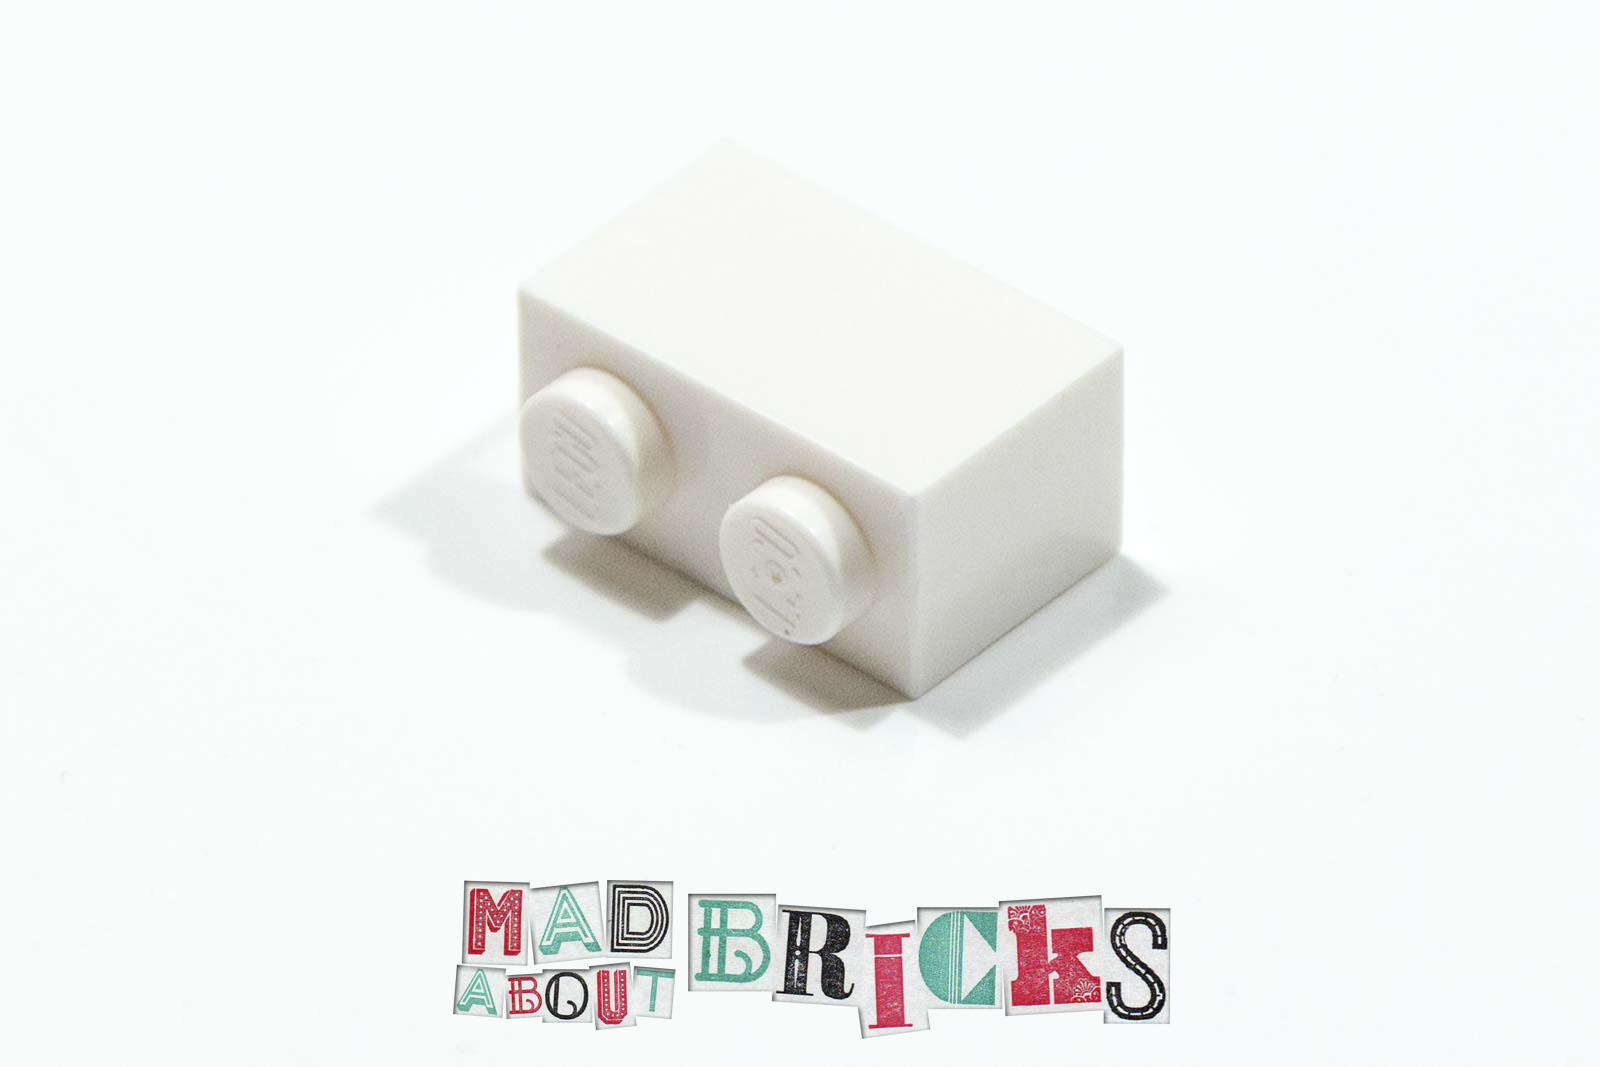 Lego BRICK 1x2 LIGHT BLUISH GREY New 3004 Qty 50